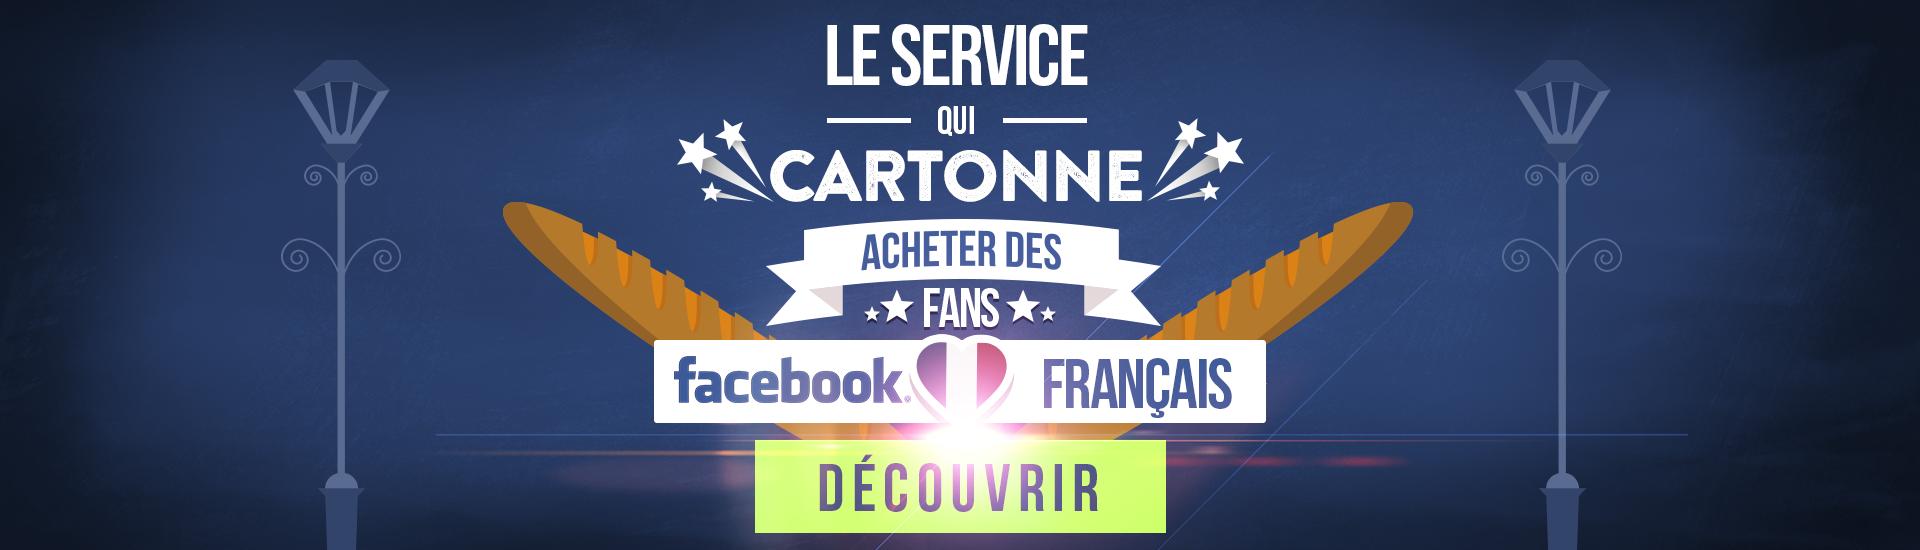 Service qui cartonne : FB FR